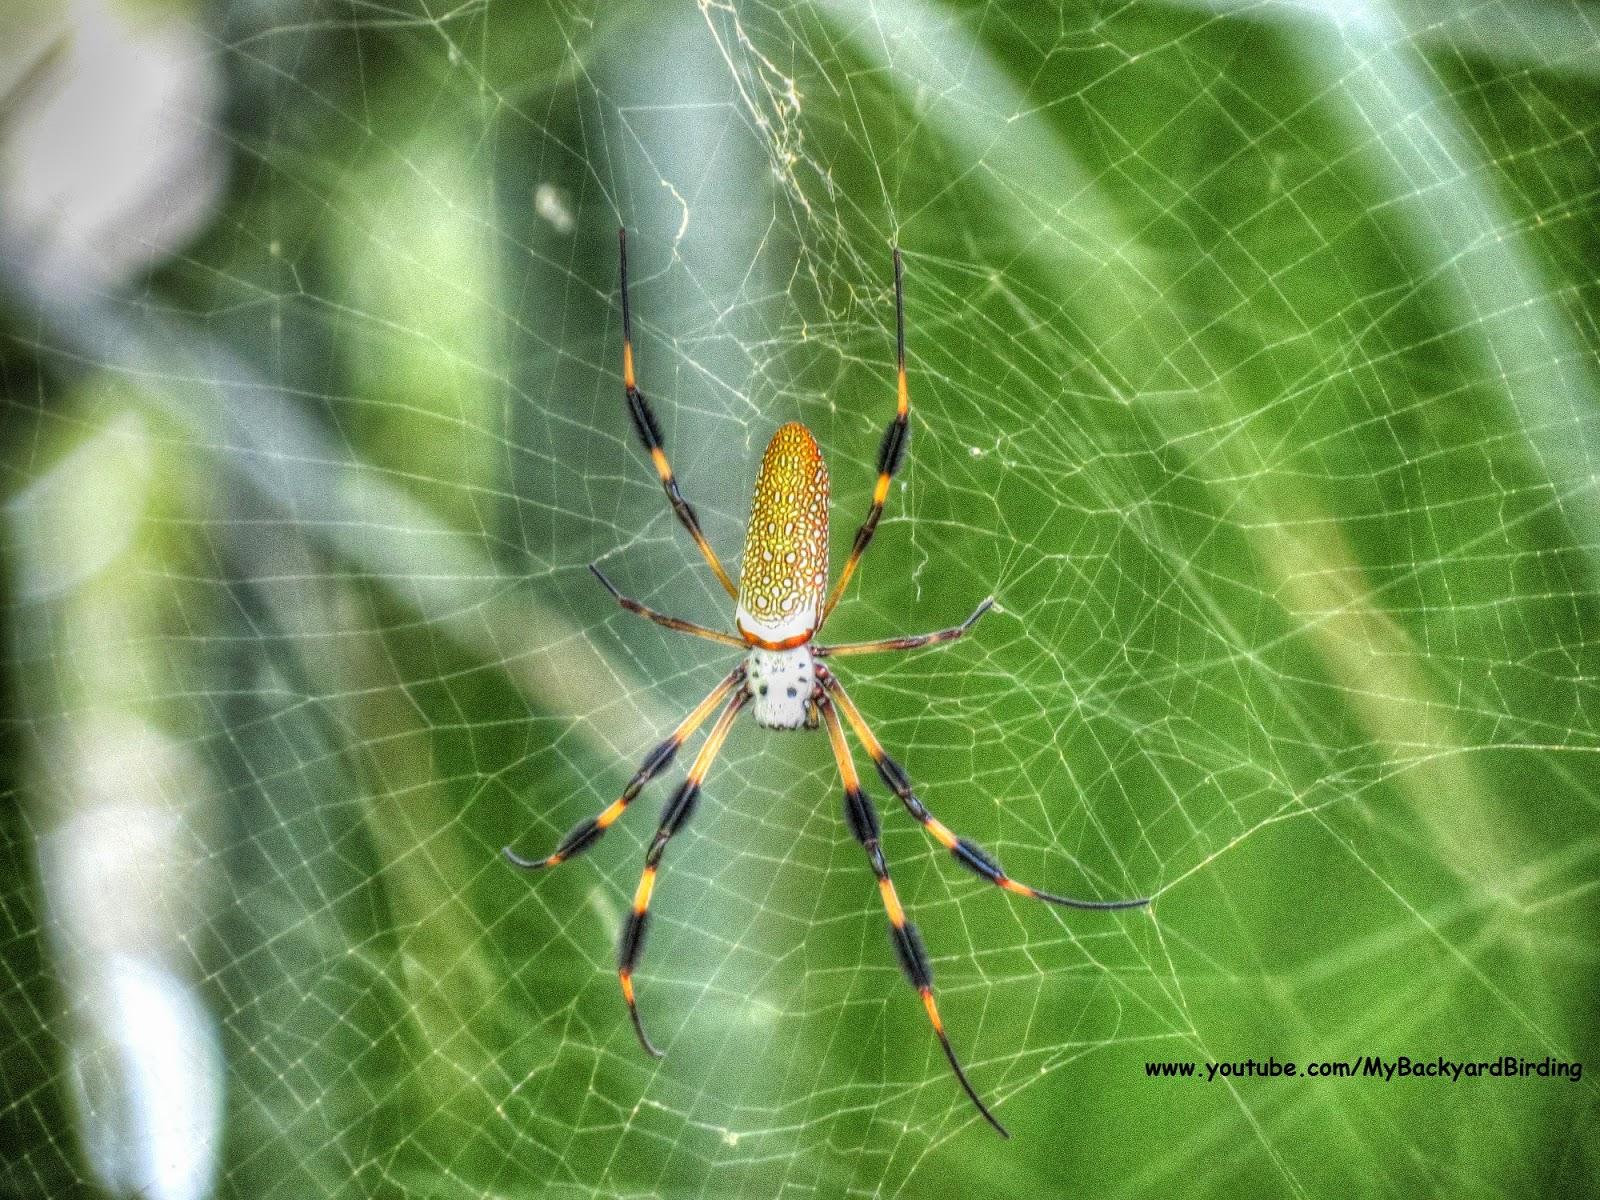 backyard birding and nature golden silk orb weaver spider in